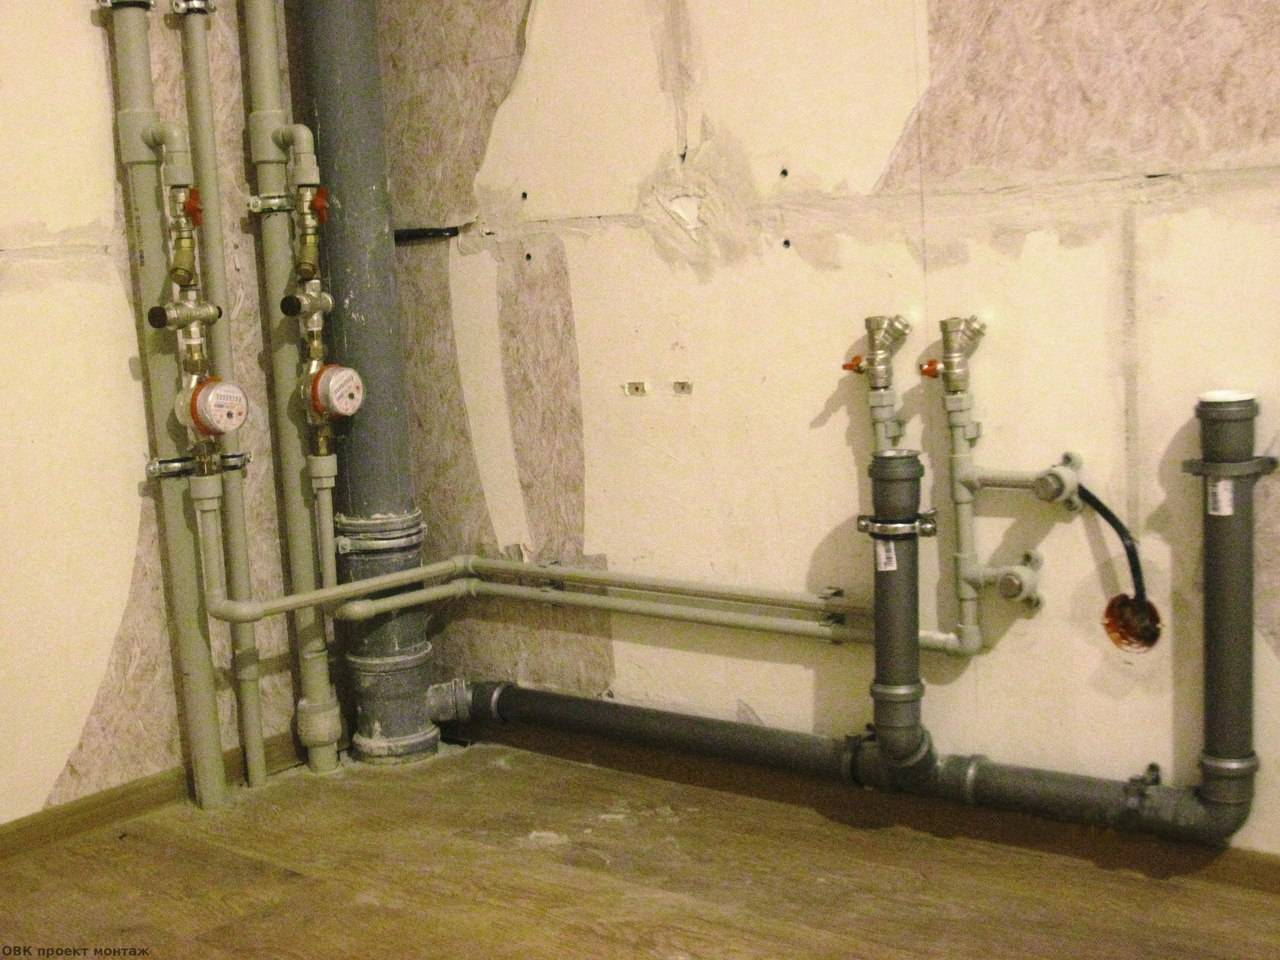 Замена стояков водоснабжения в квартире: права и обязанности, порядок проведения